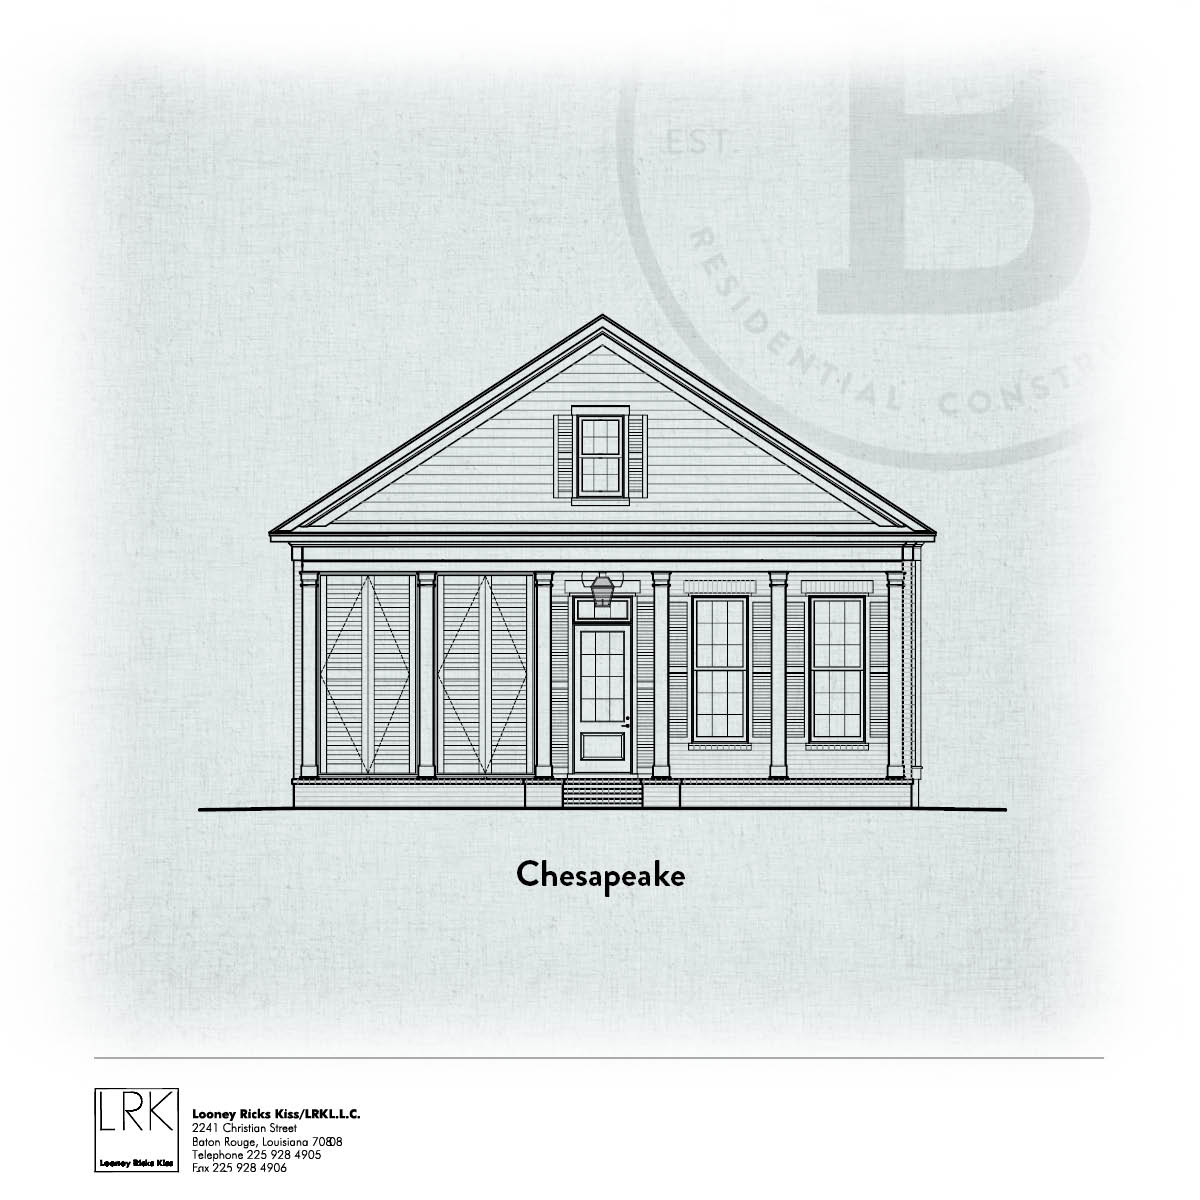 Chesapeake Elevation